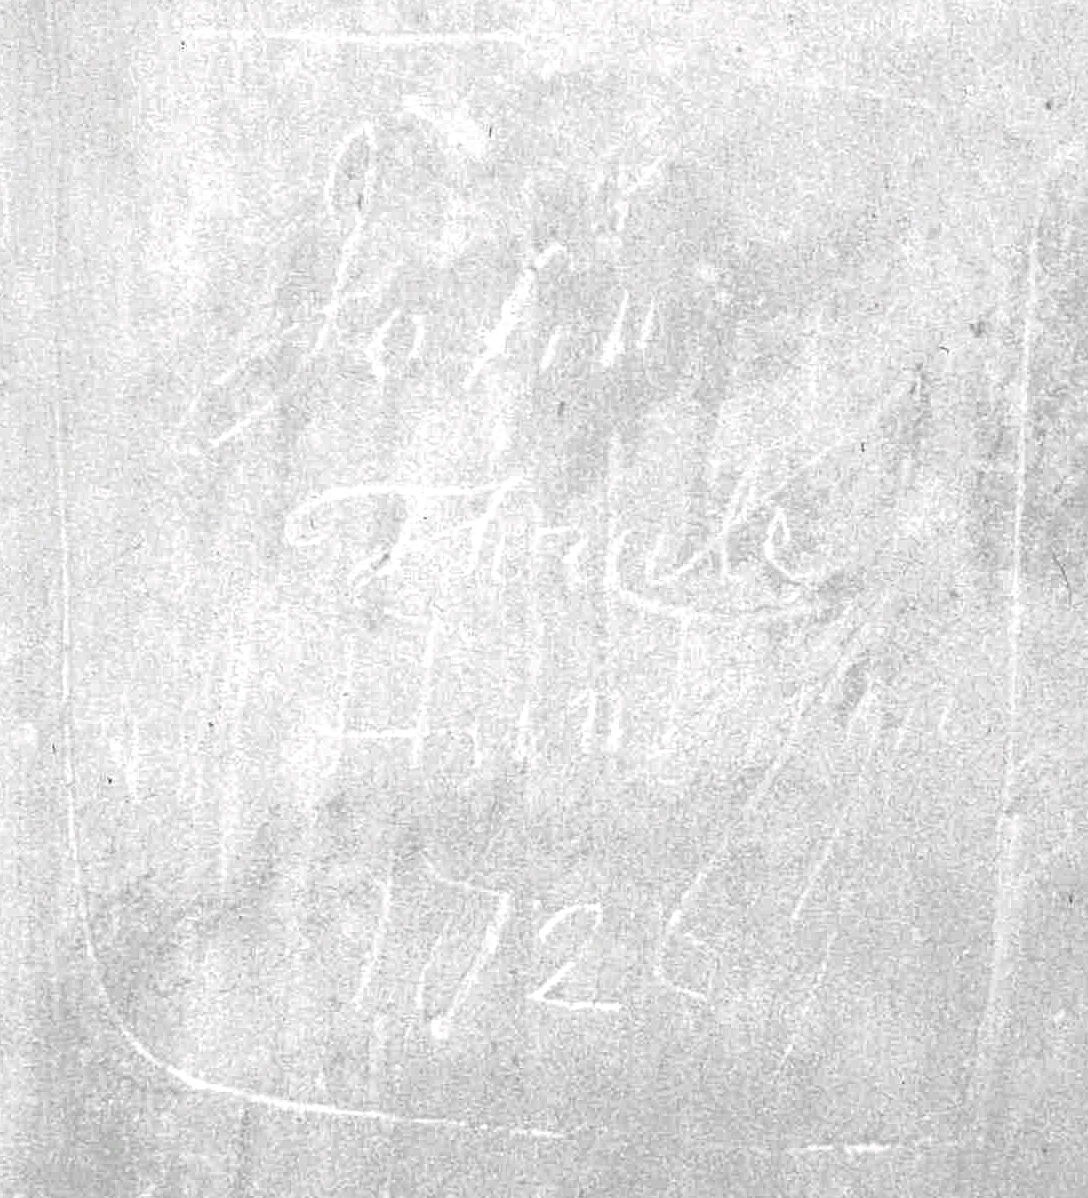 John Thrale 1726 graffiti, St Albans Cathedral